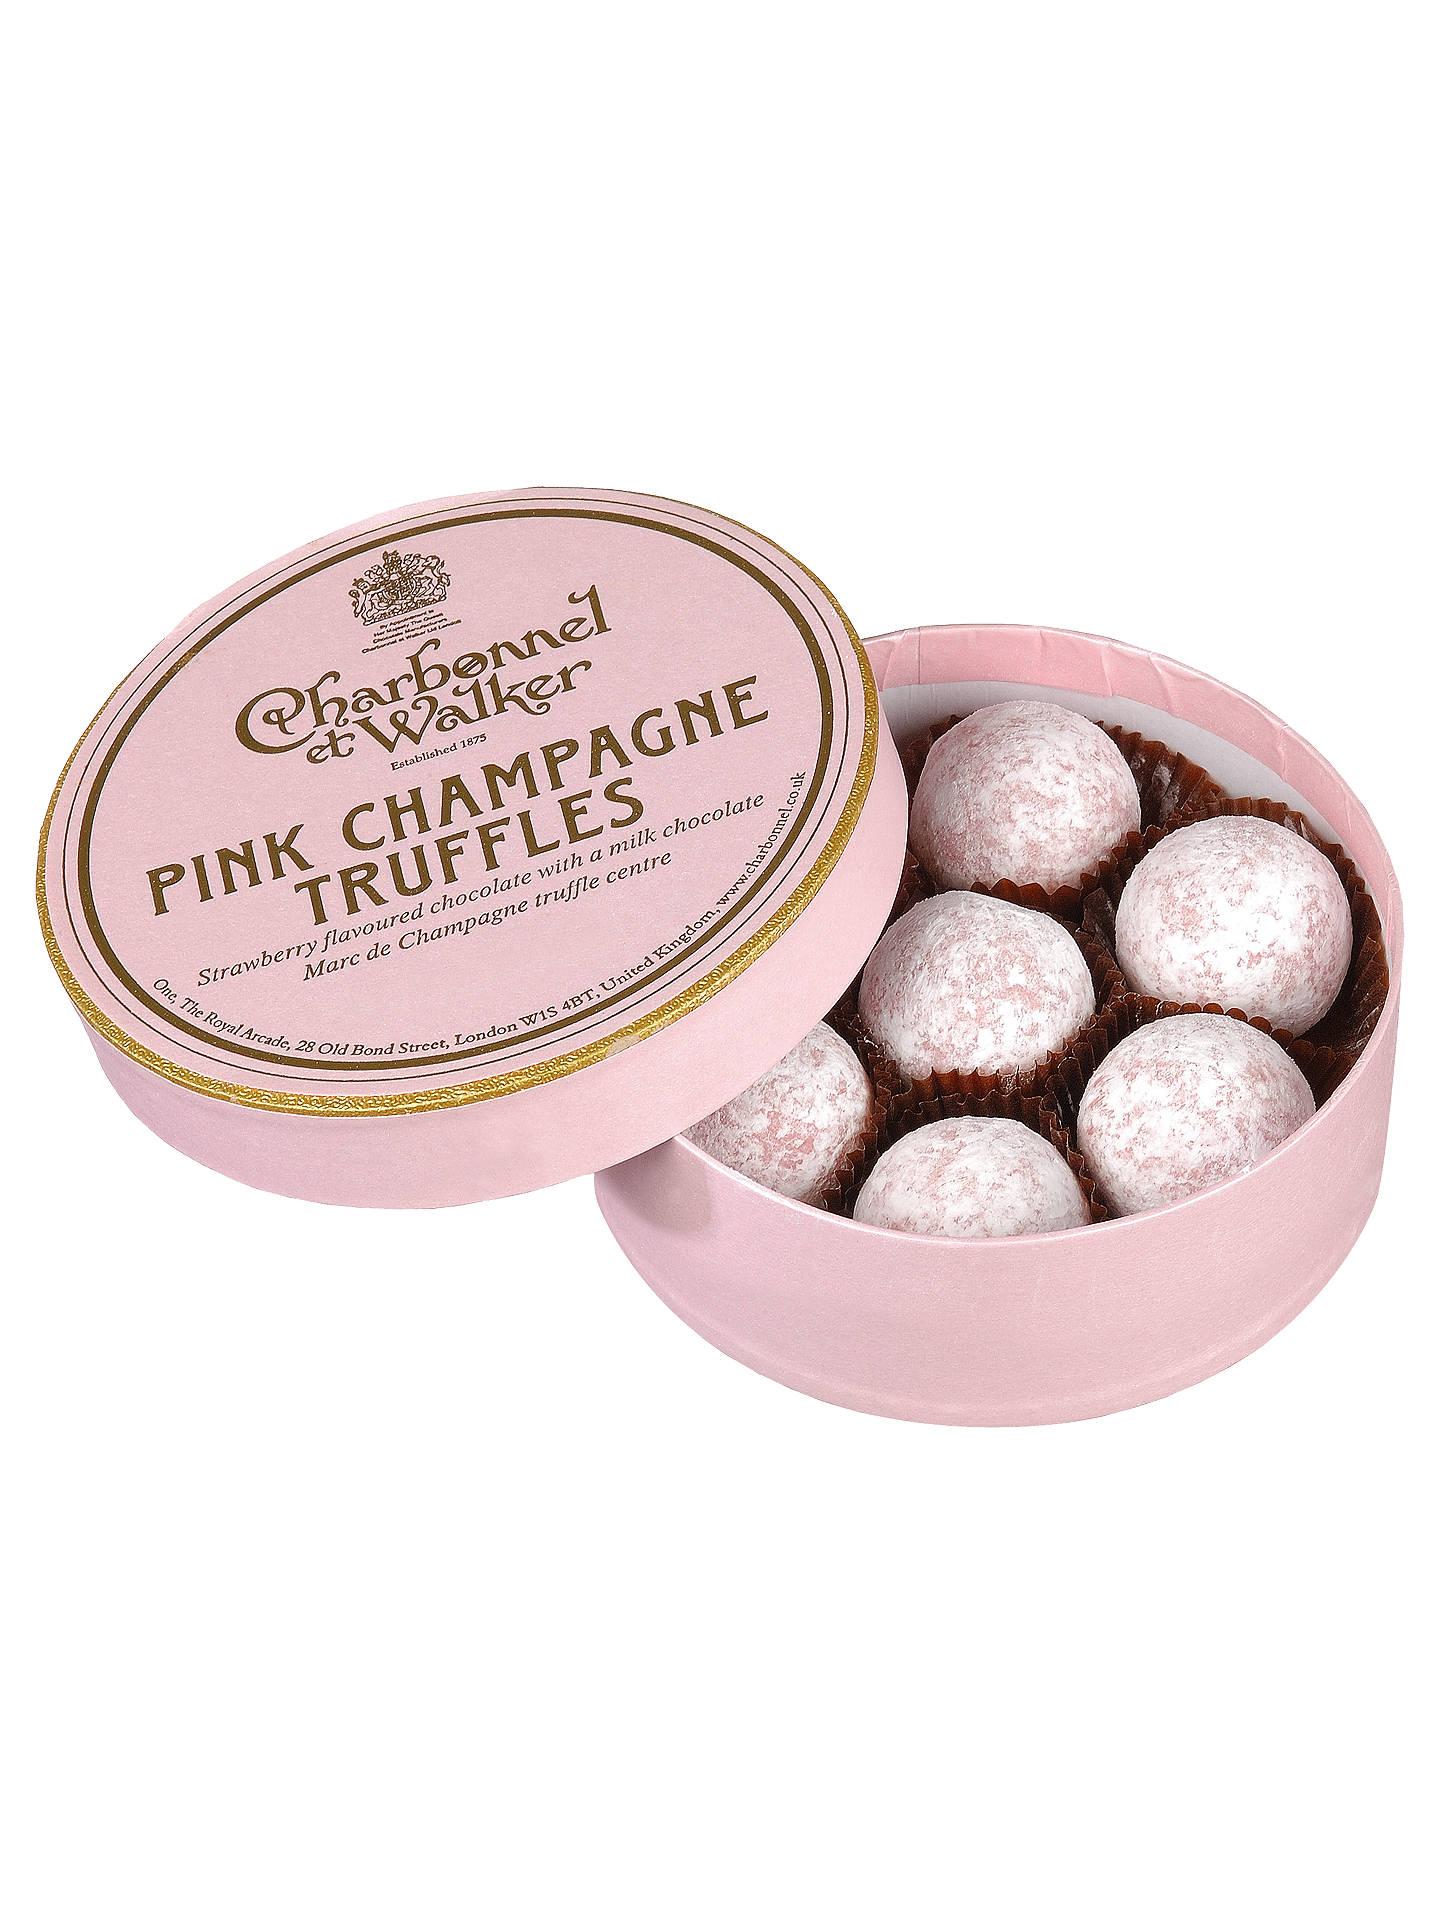 BuyCharbonnel et Walker Pink Champagne Truffles 0481ff703